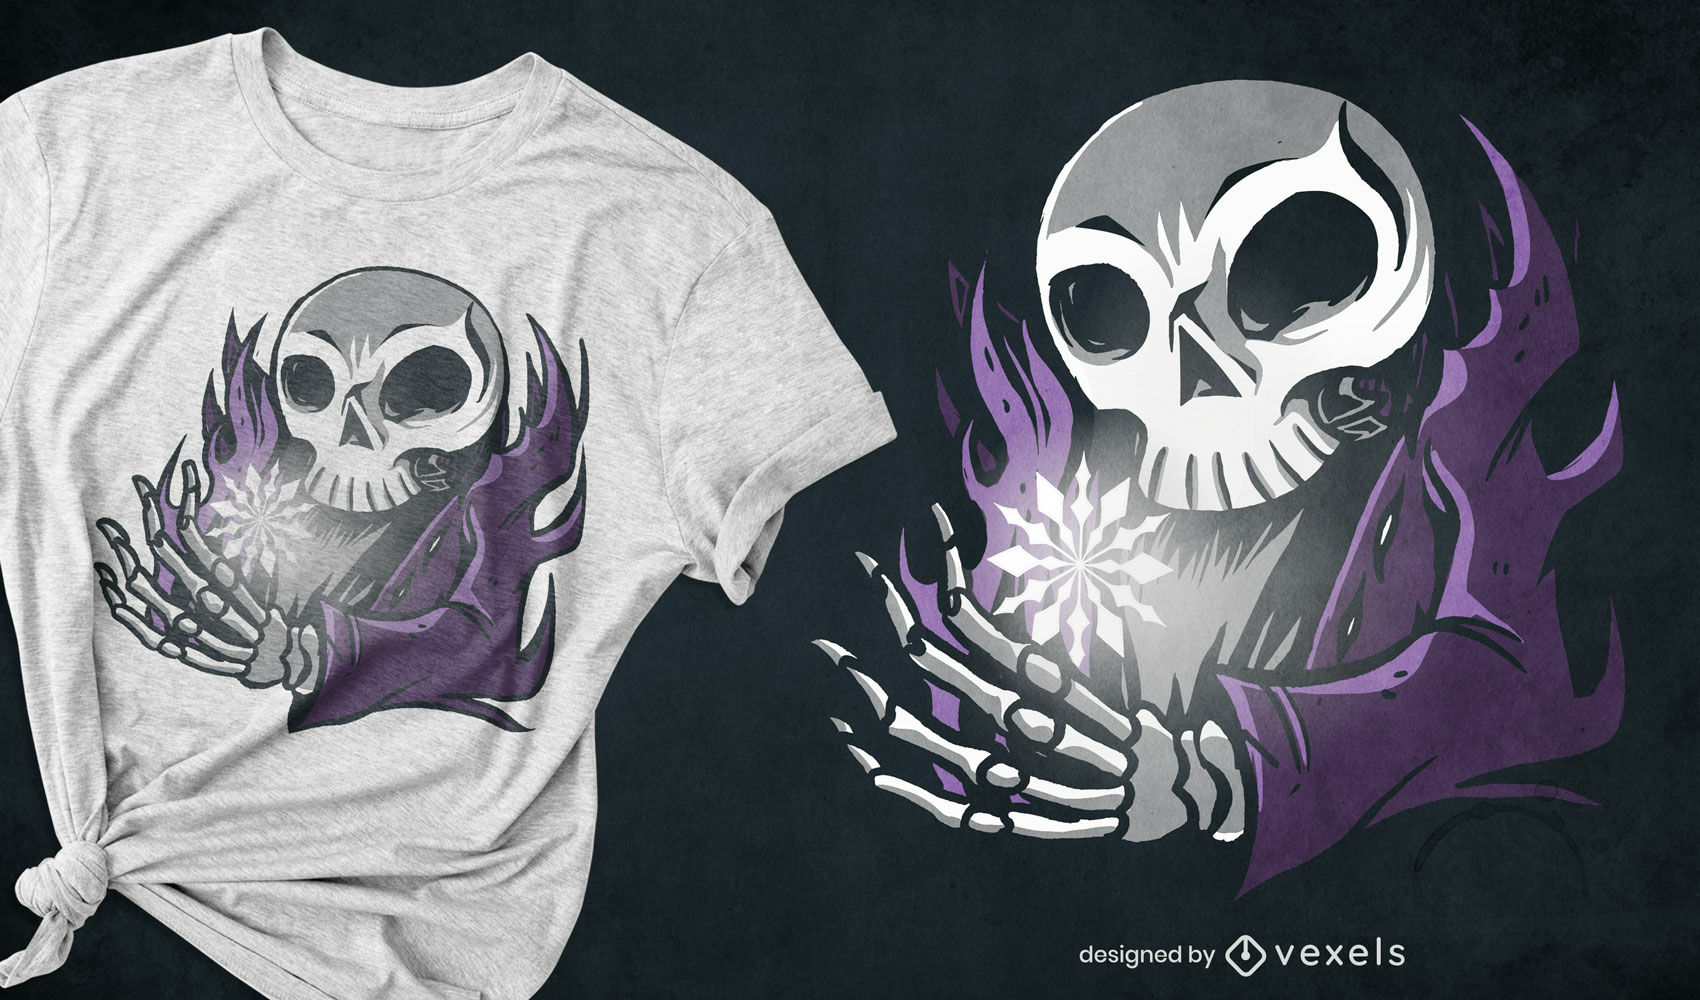 Skeleton and snowflake t-shirt design